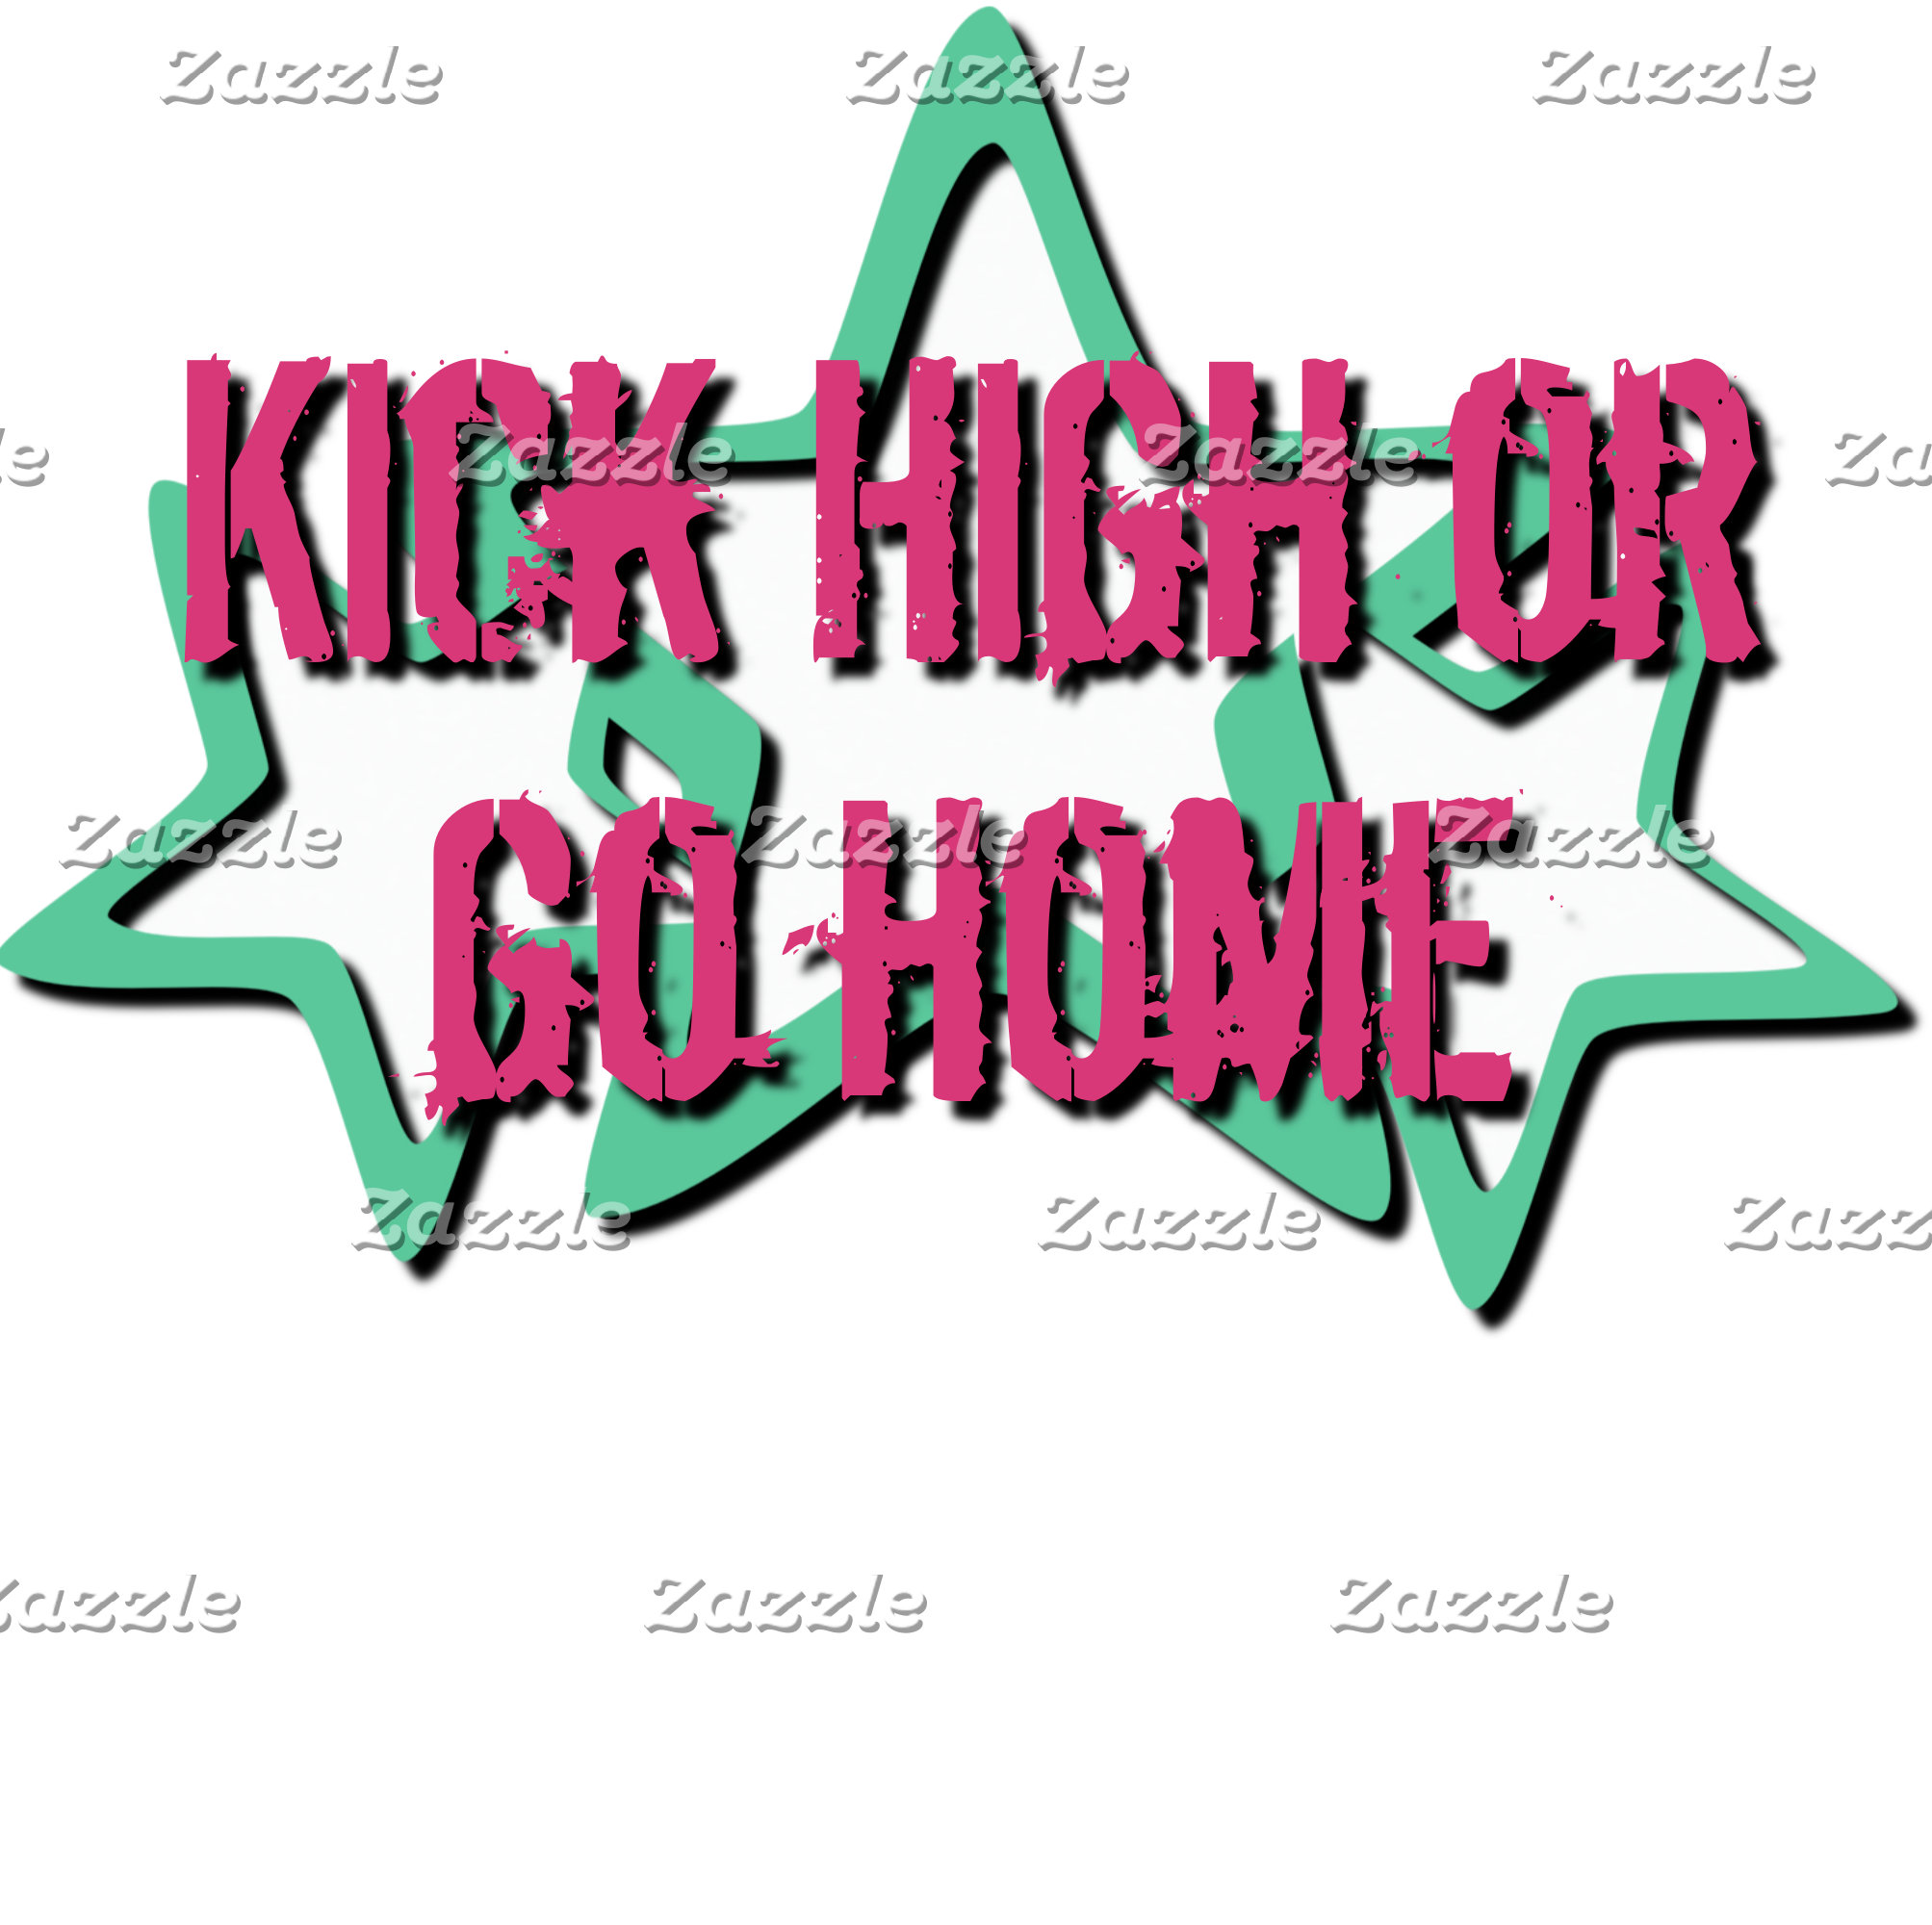 Drill Team: Kick High or Go Home